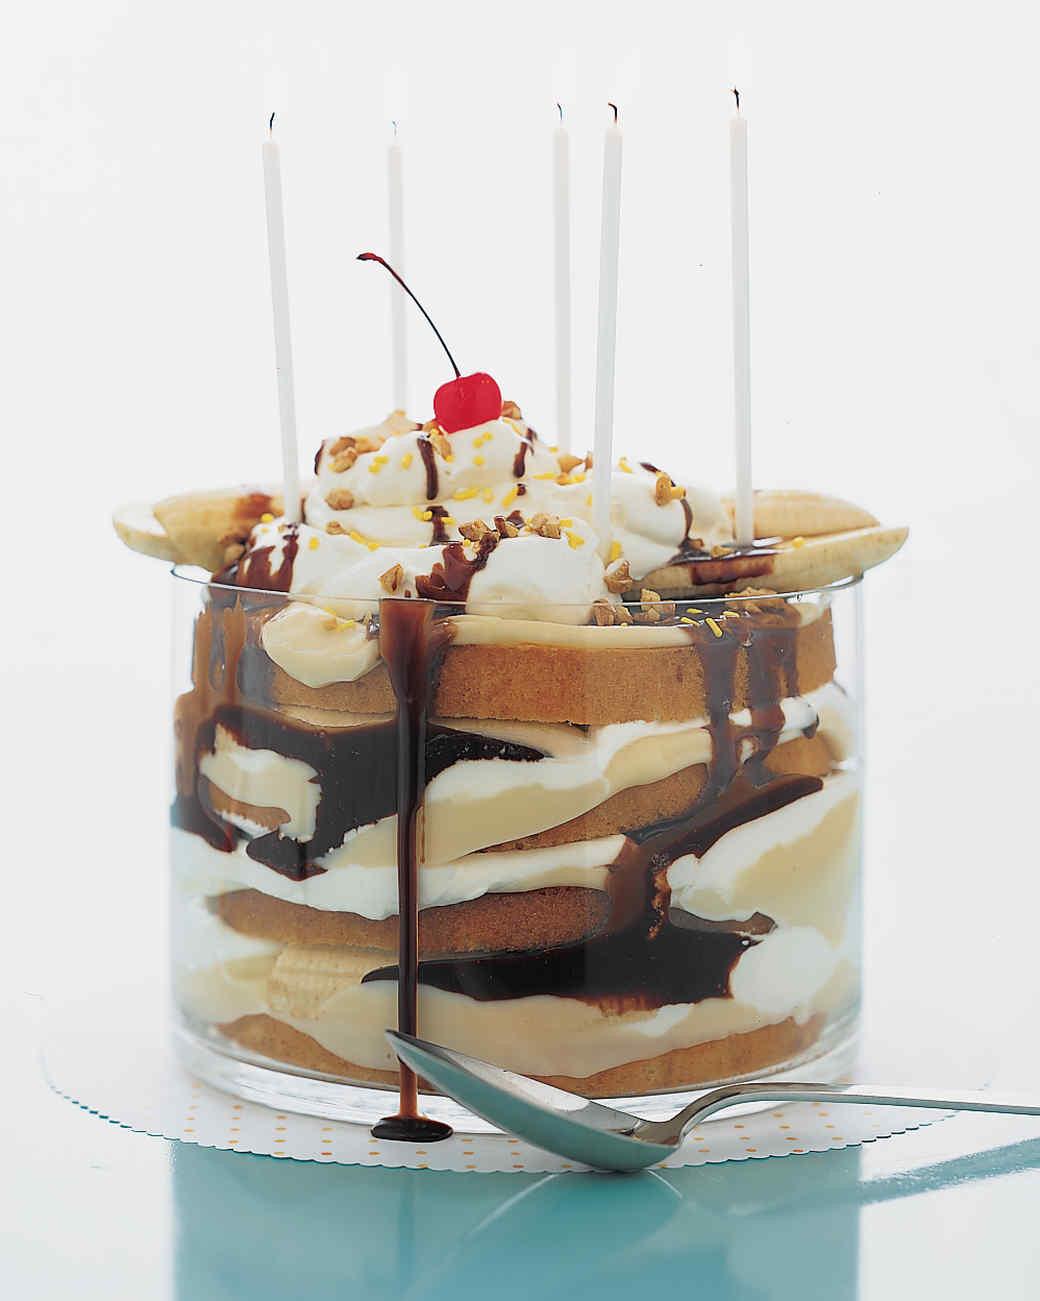 Kids Birthday Cake Recepies  Kids Birthday Cake Recipes